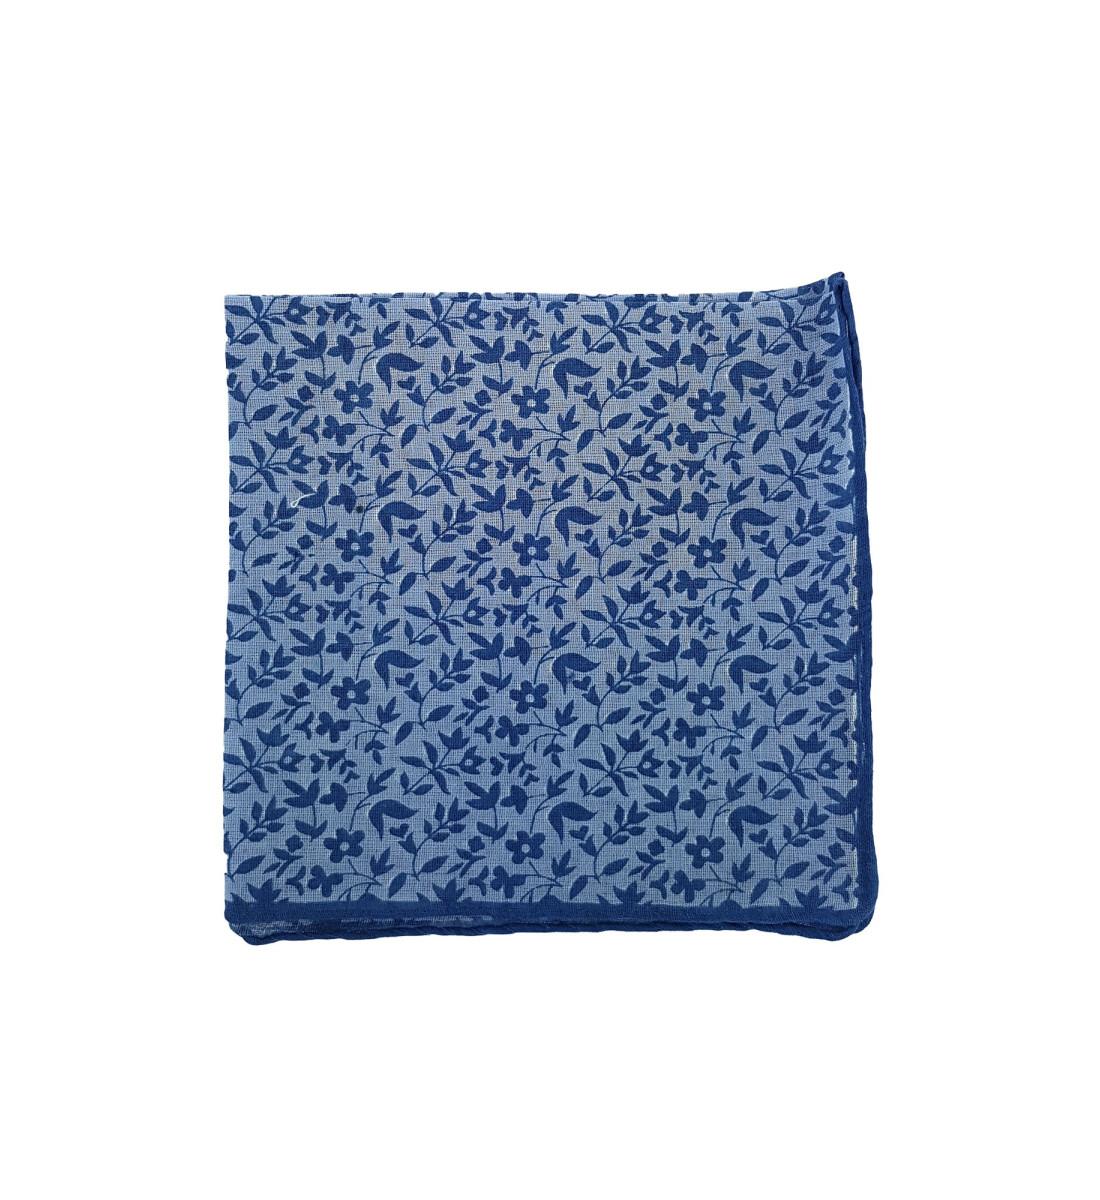 Pochette en coton motif floral BLEU